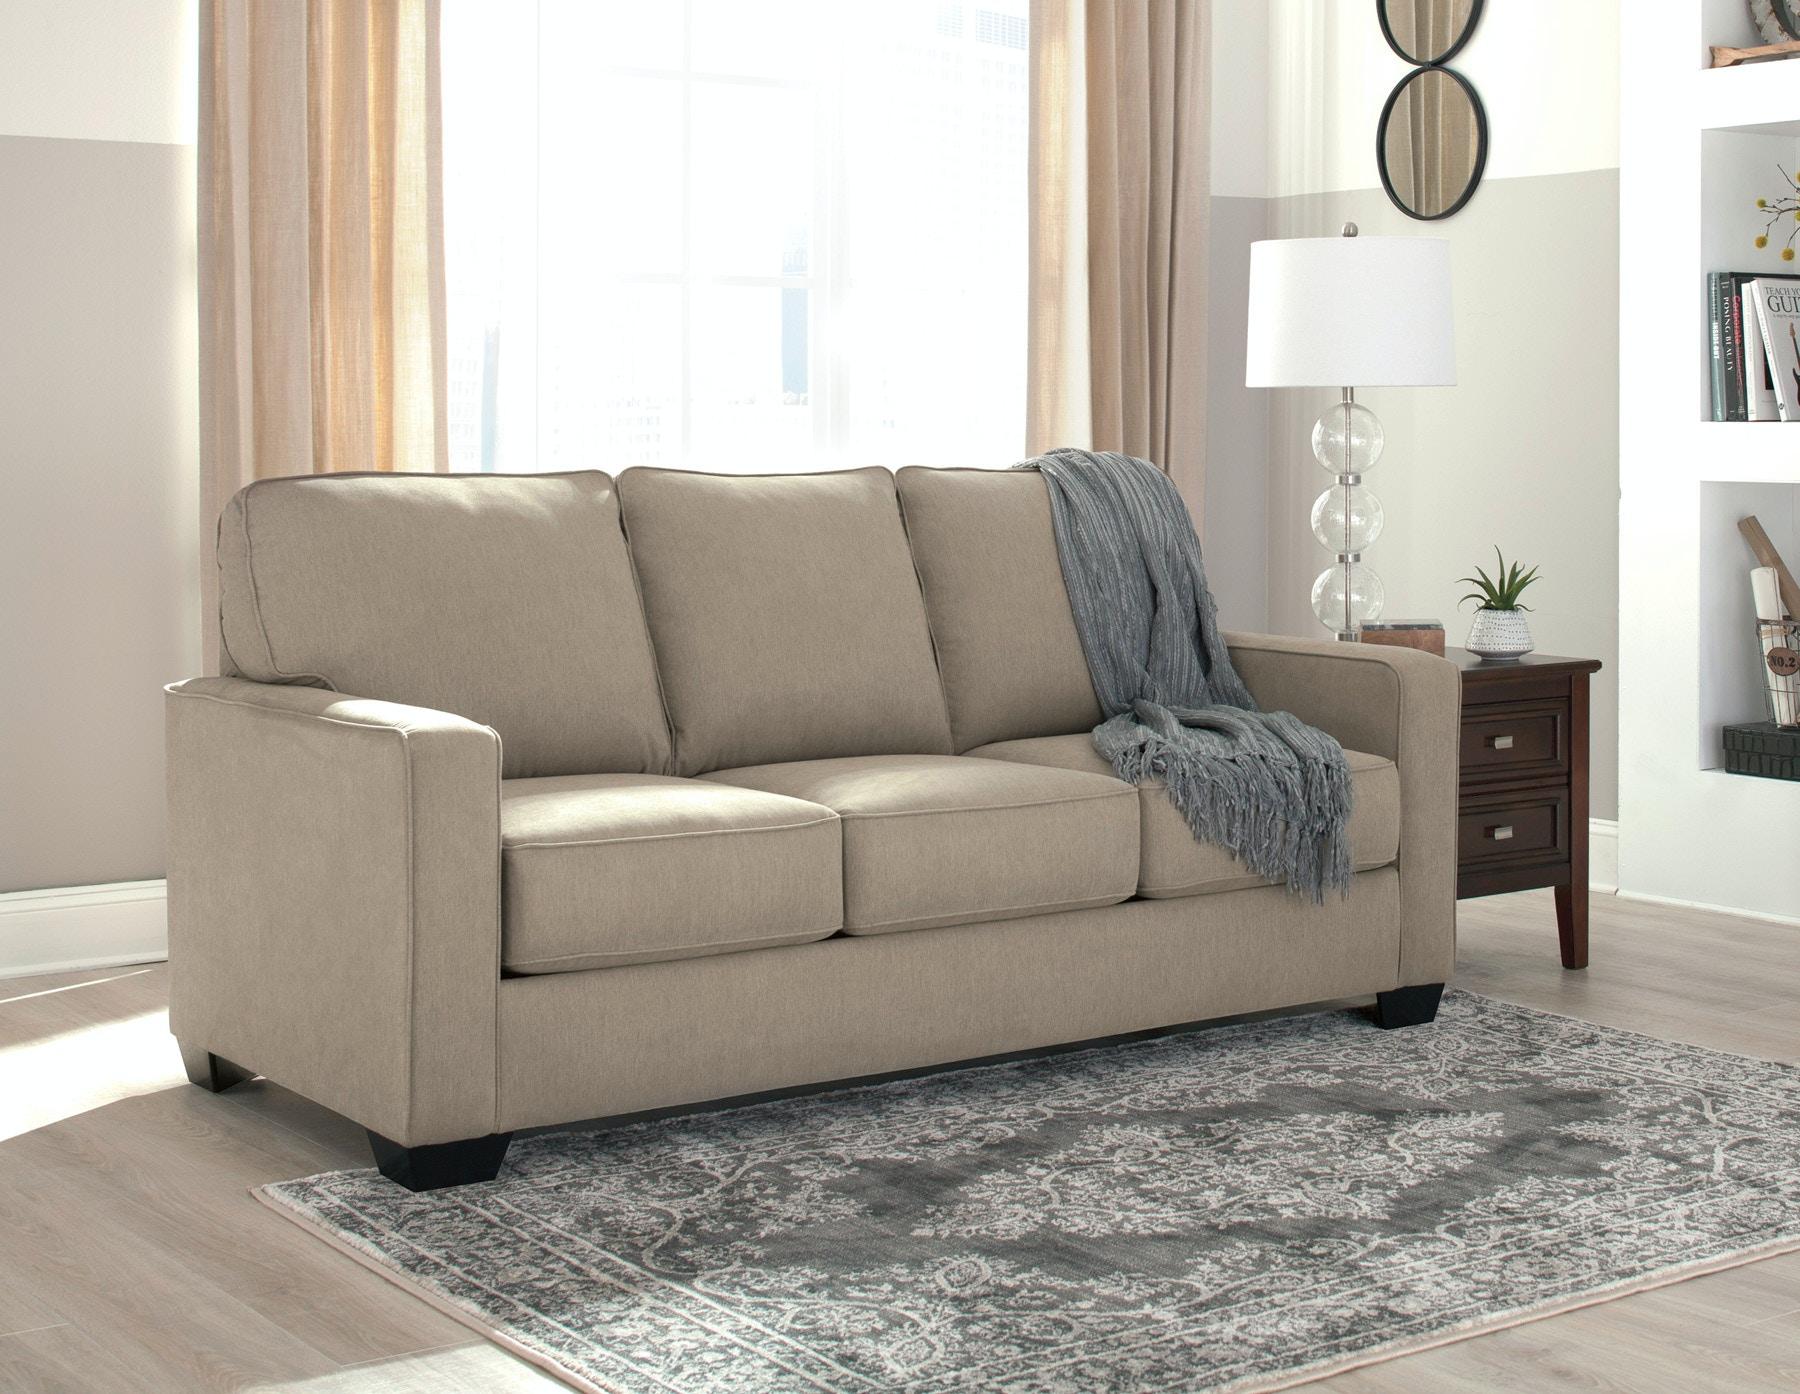 Signature Design by Ashley Living Room Zeb Full Sleeper Sofa